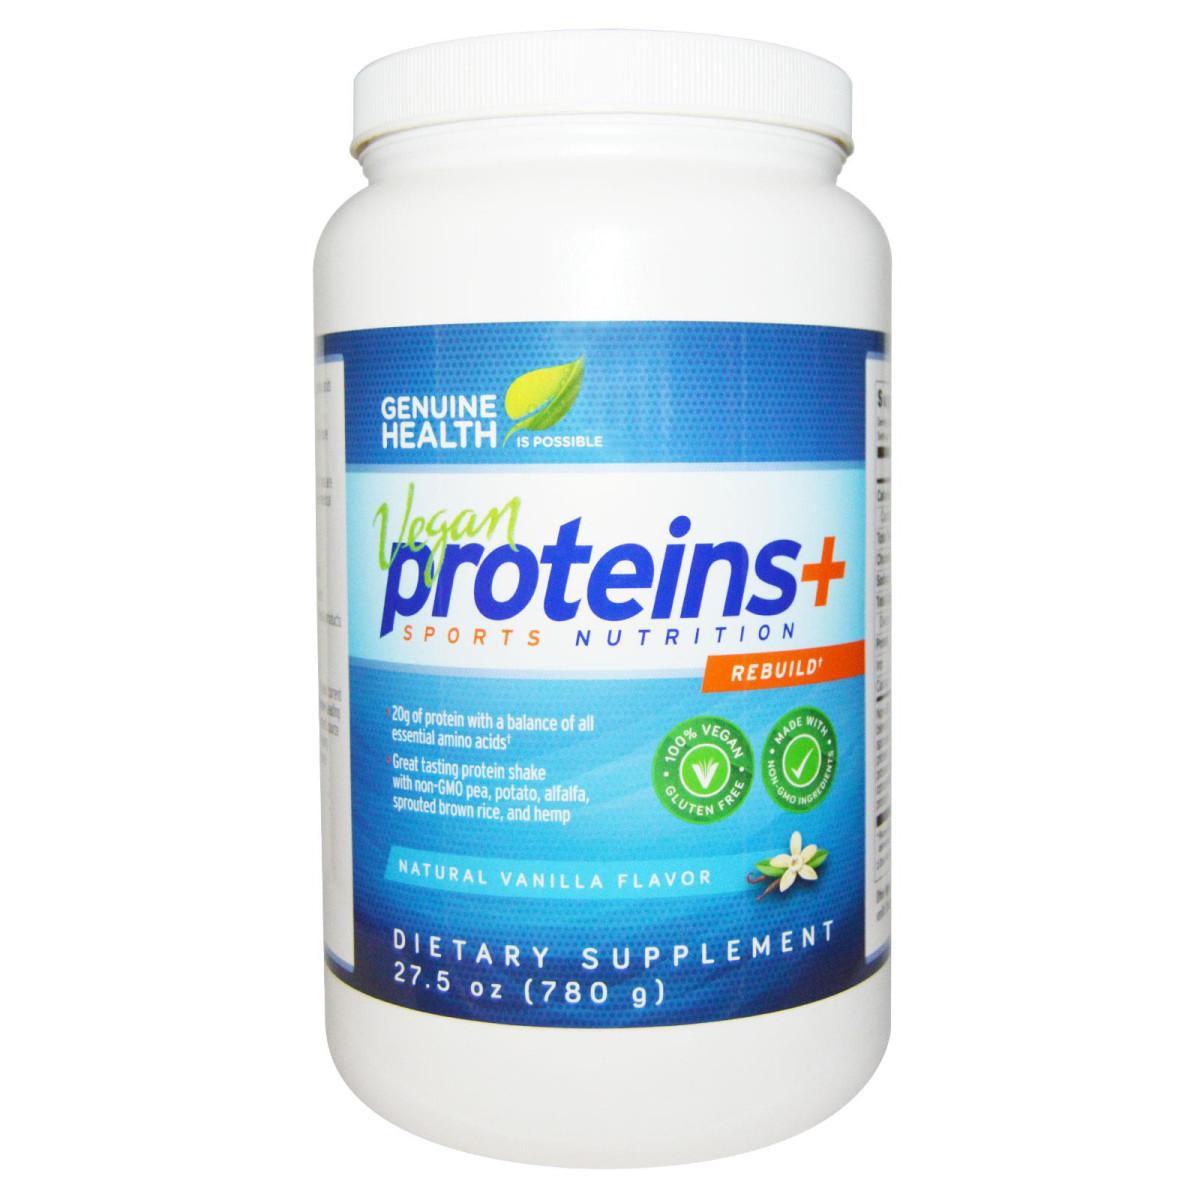 Genuine Health Vegan Proteins Plus